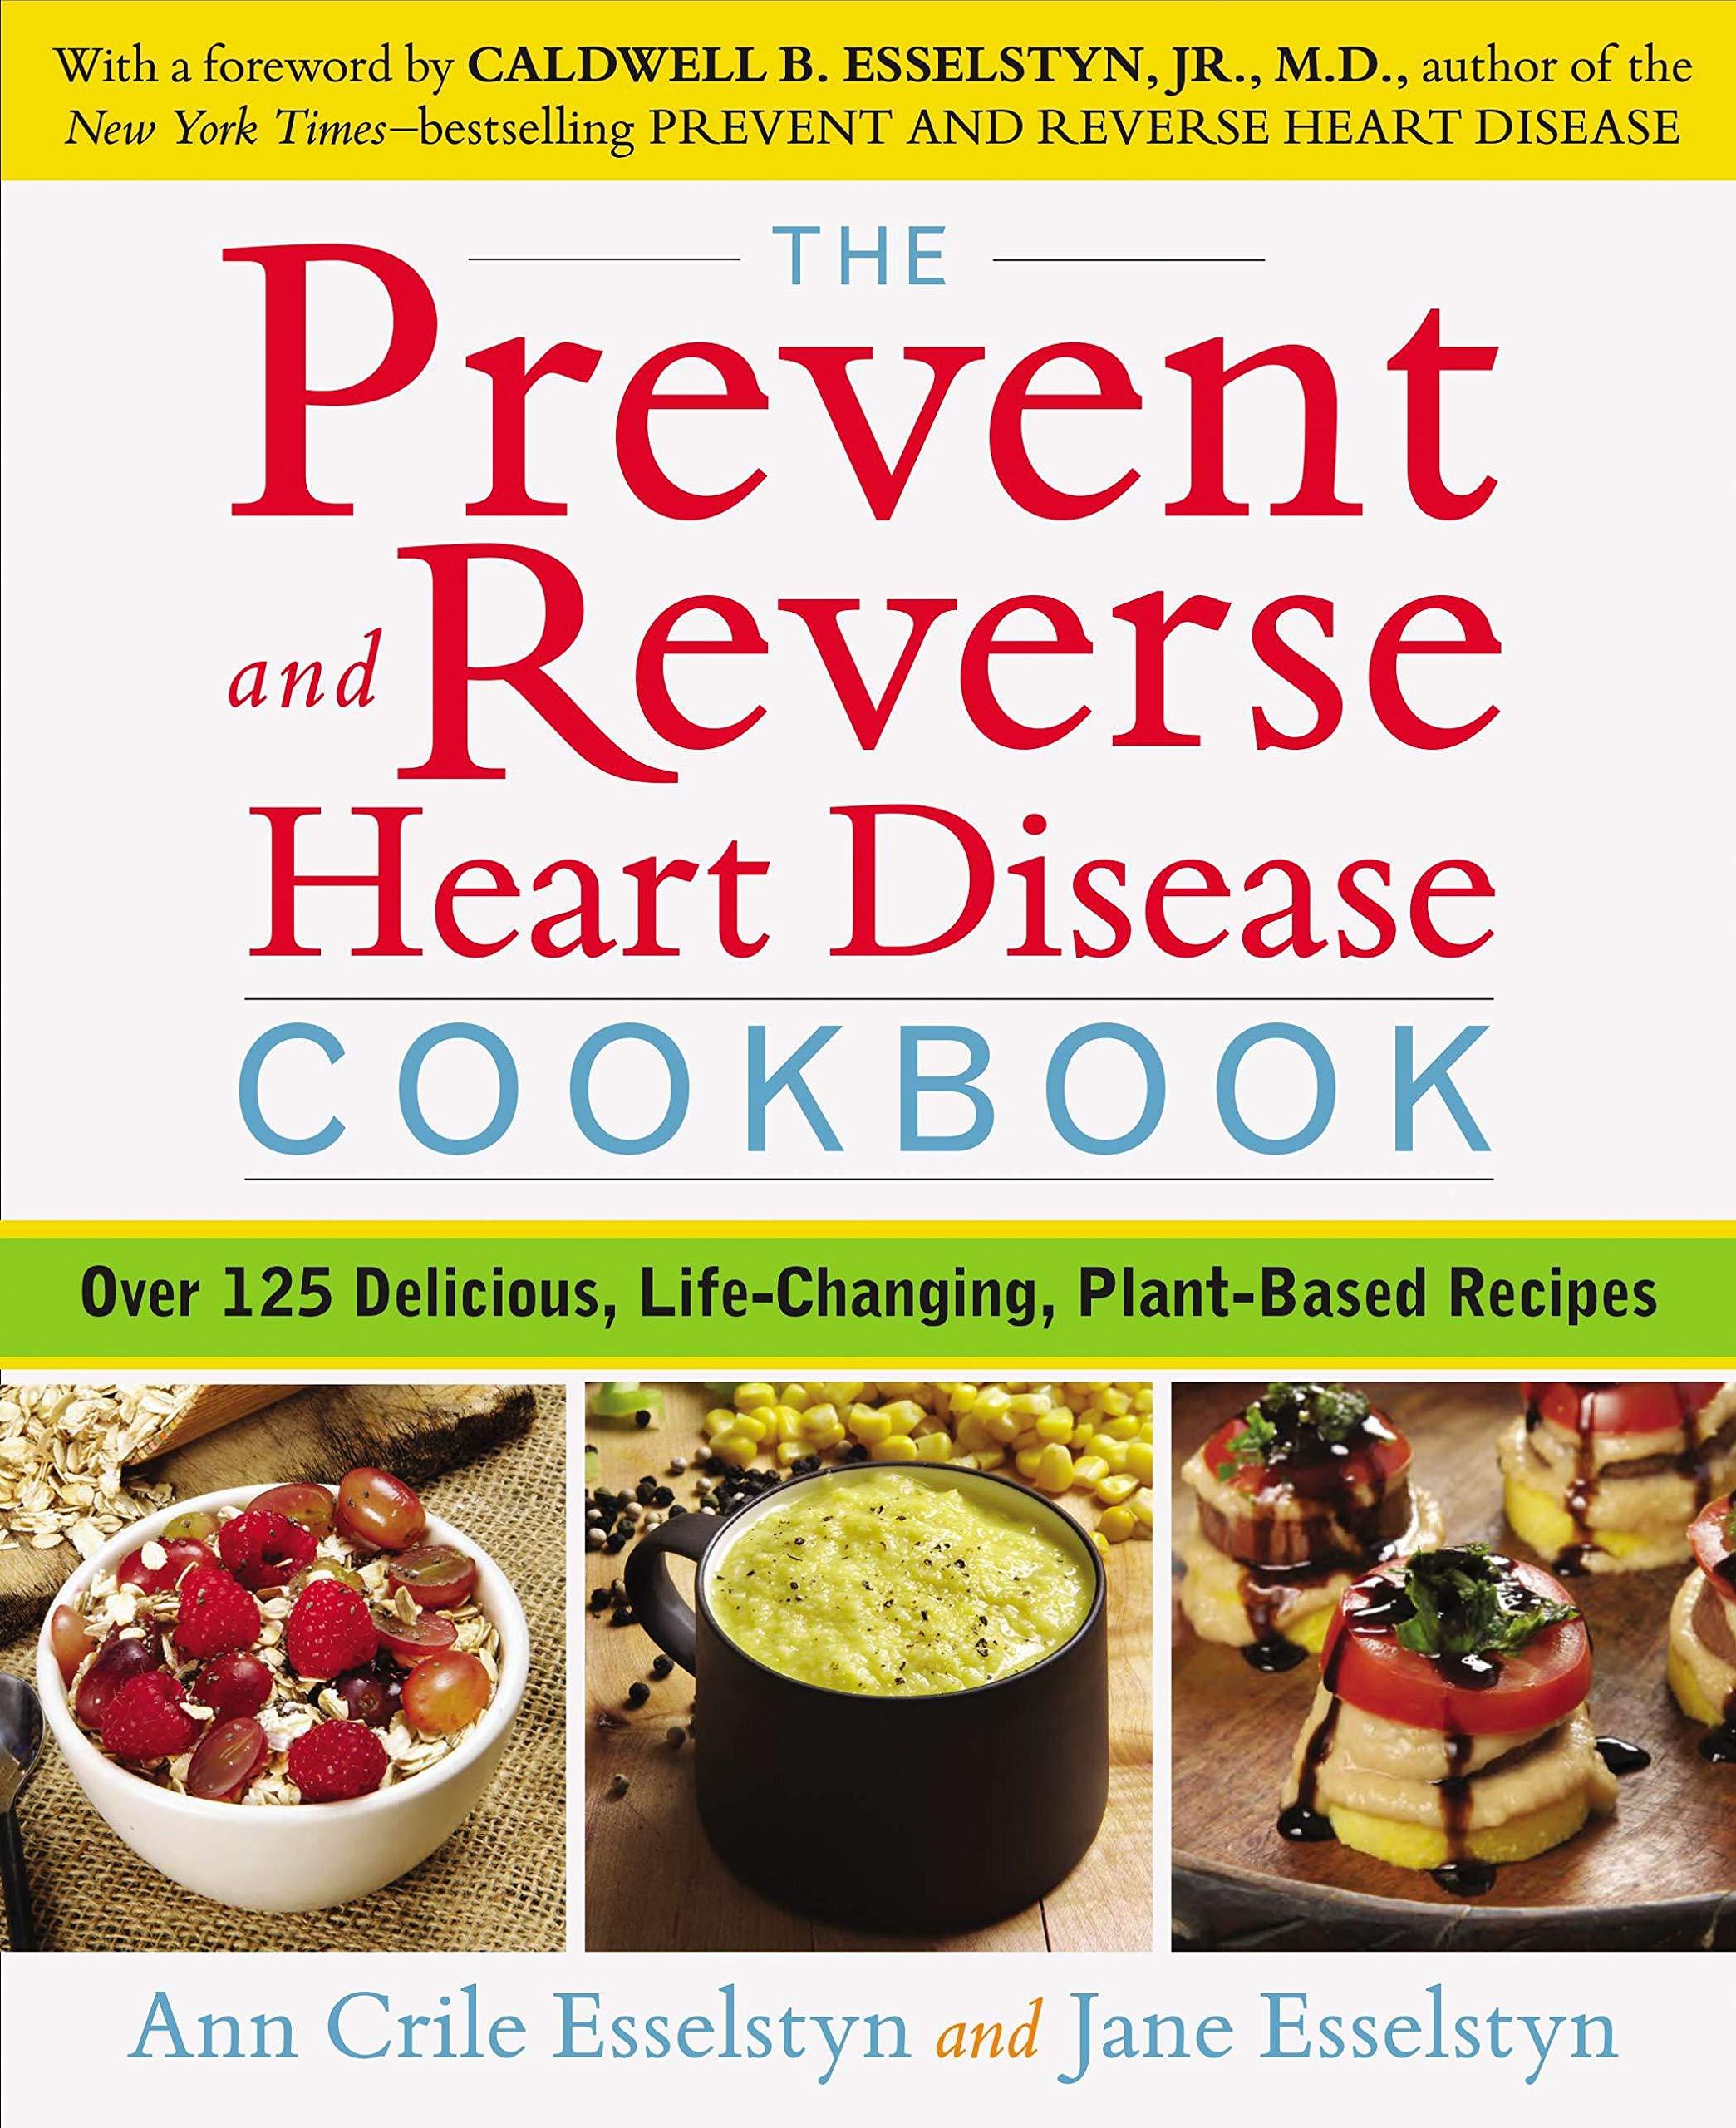 diet book for congestive heart failure